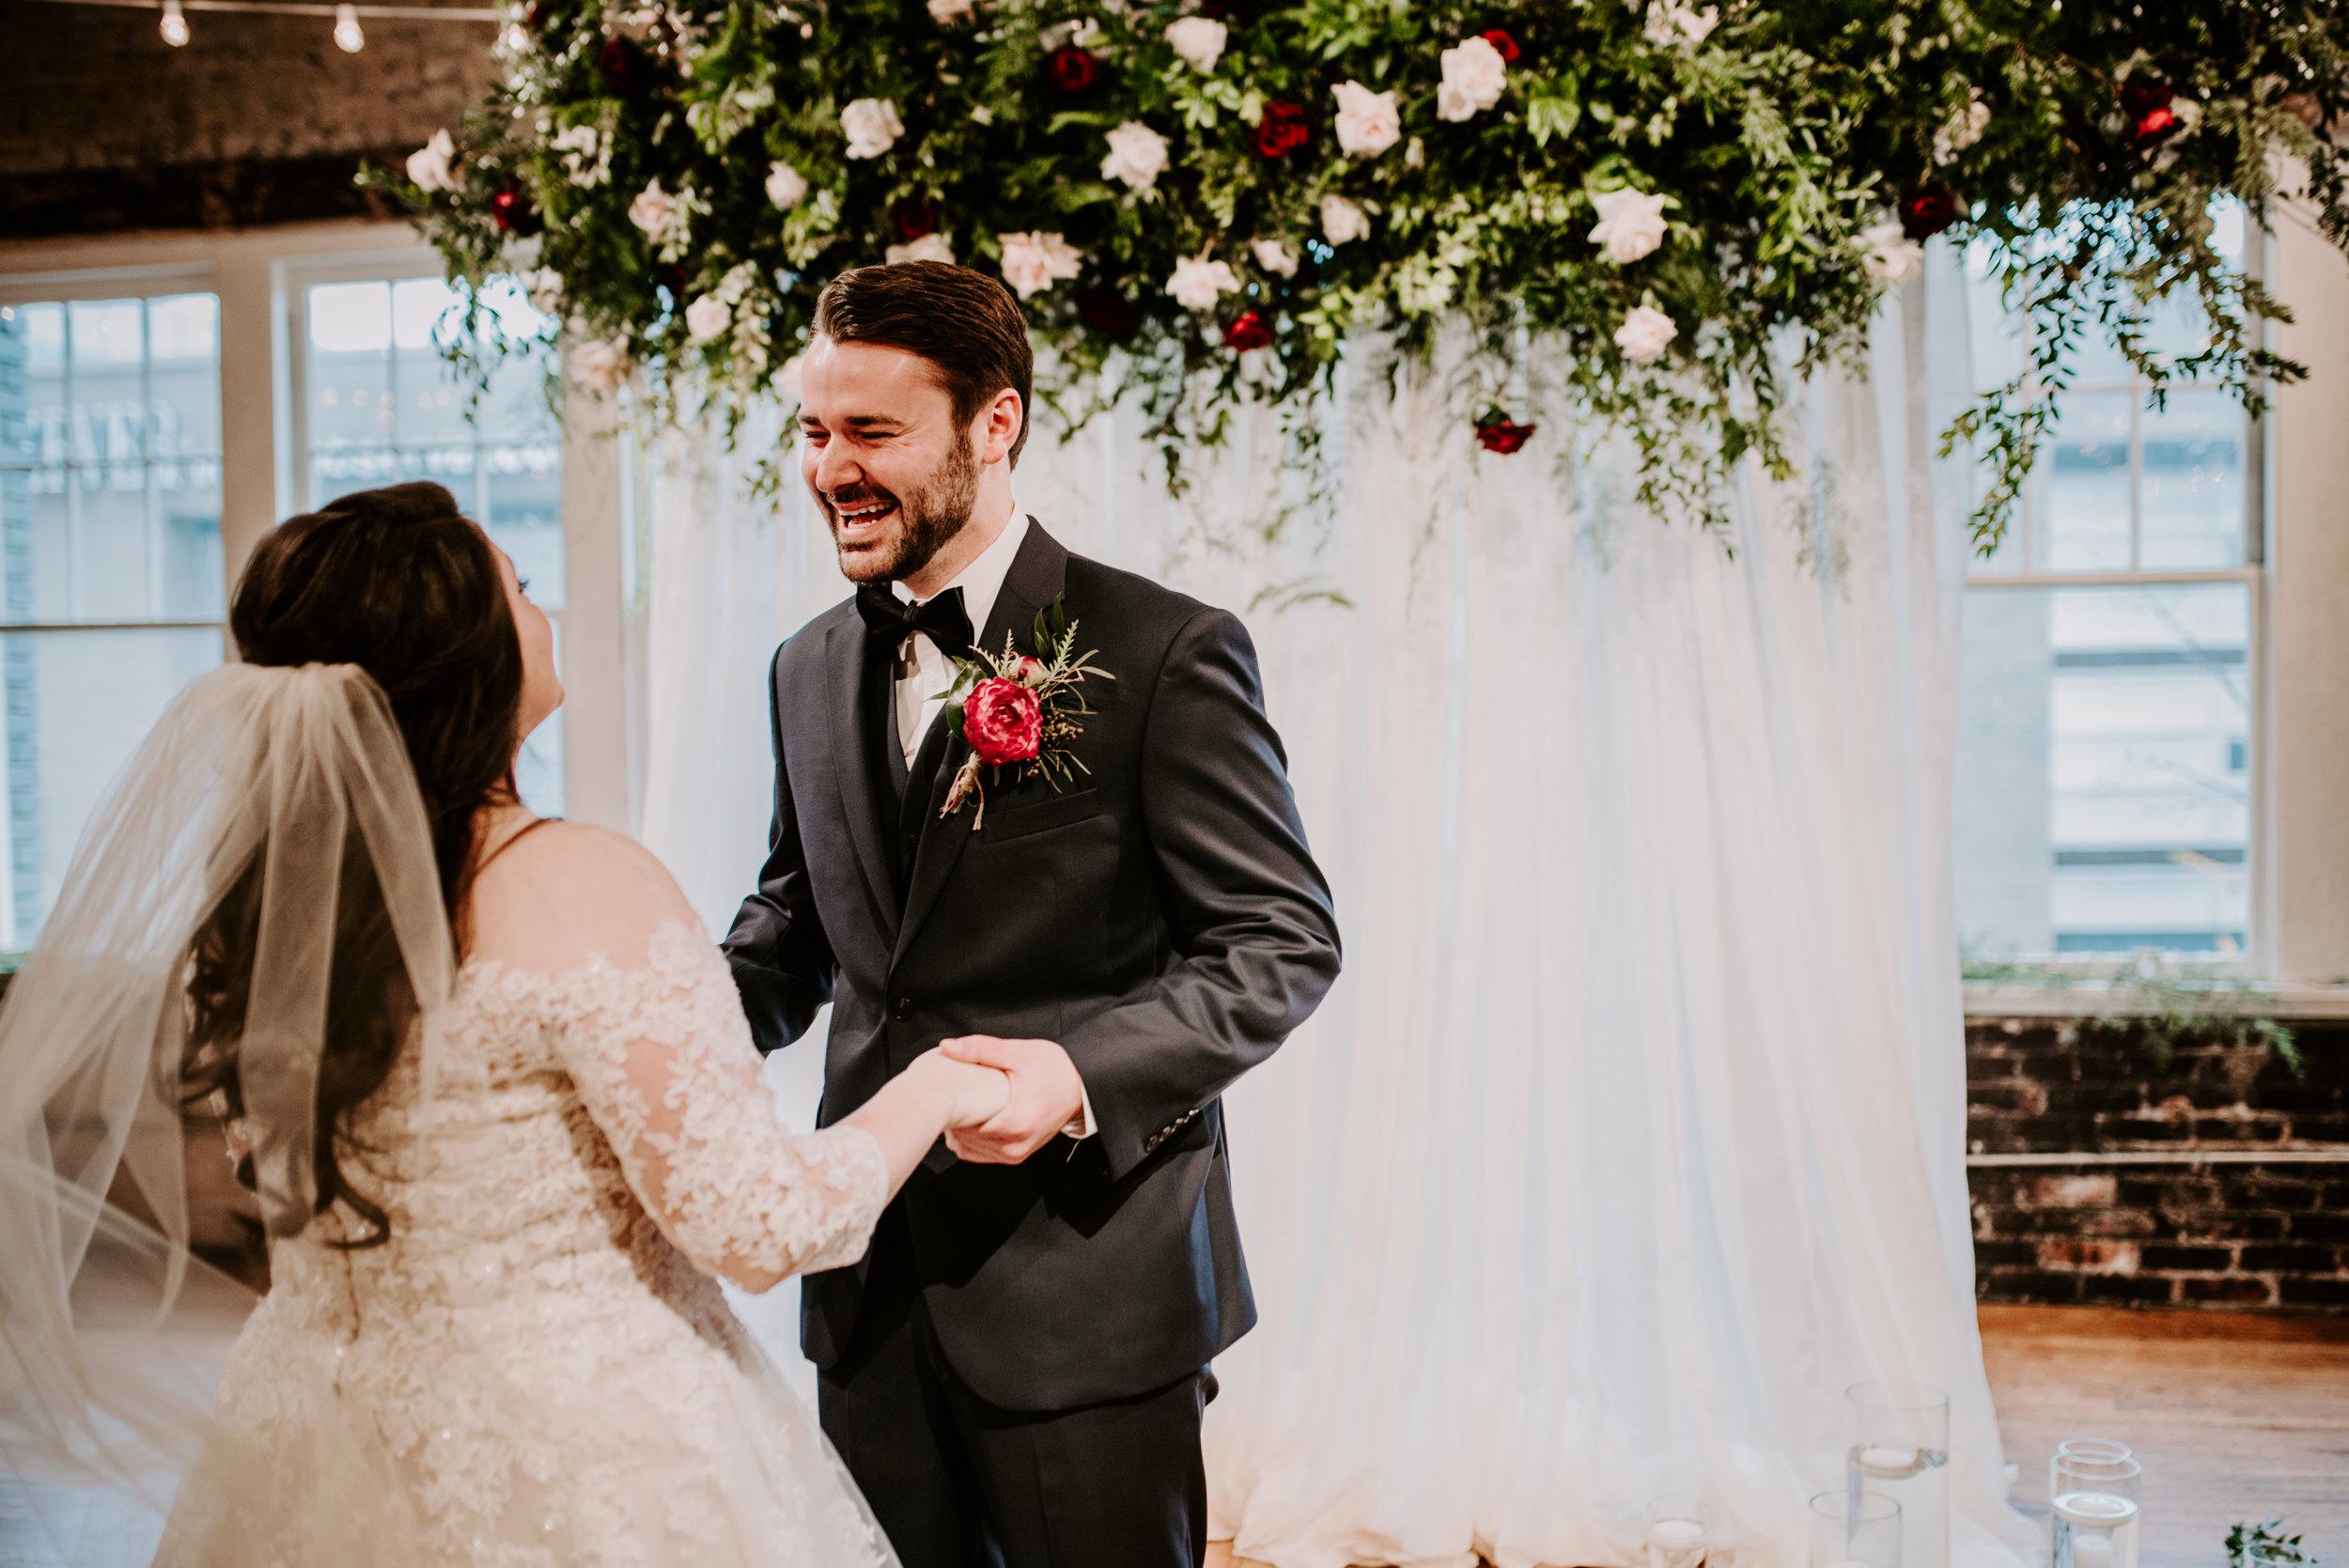 Raleigh Wedding - The Stockroom at 230 Wedding - Raleigh Wedding Photographer - North Carolina Wedding Photographer